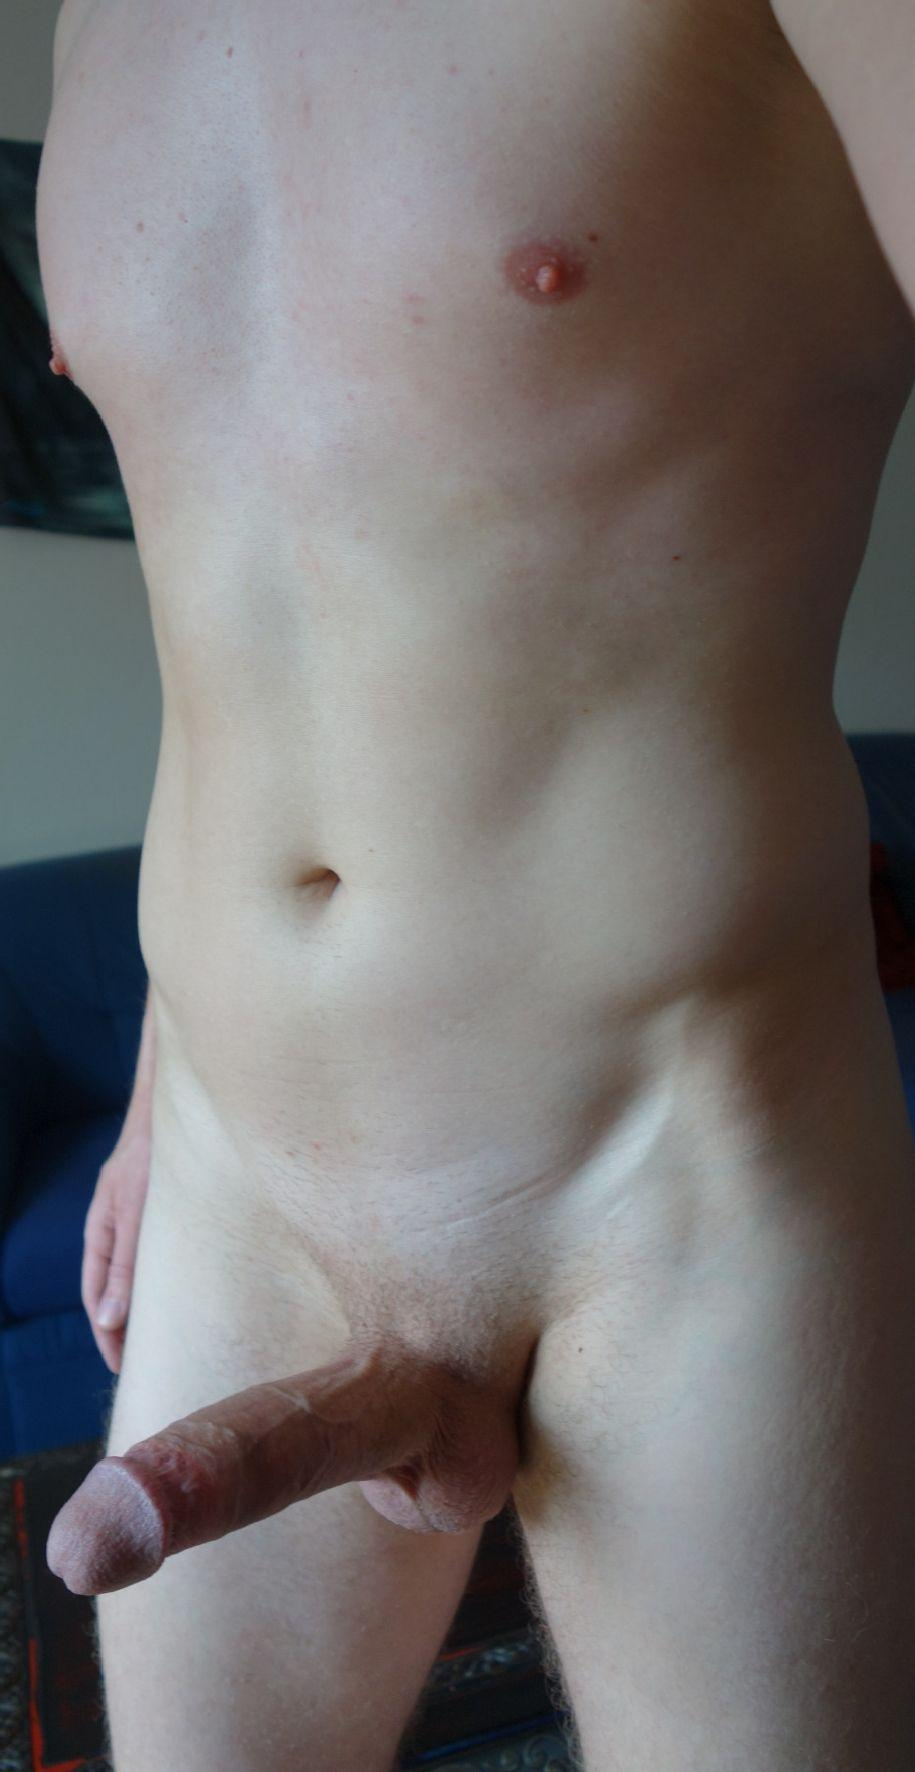 Boy pic penis Sizes